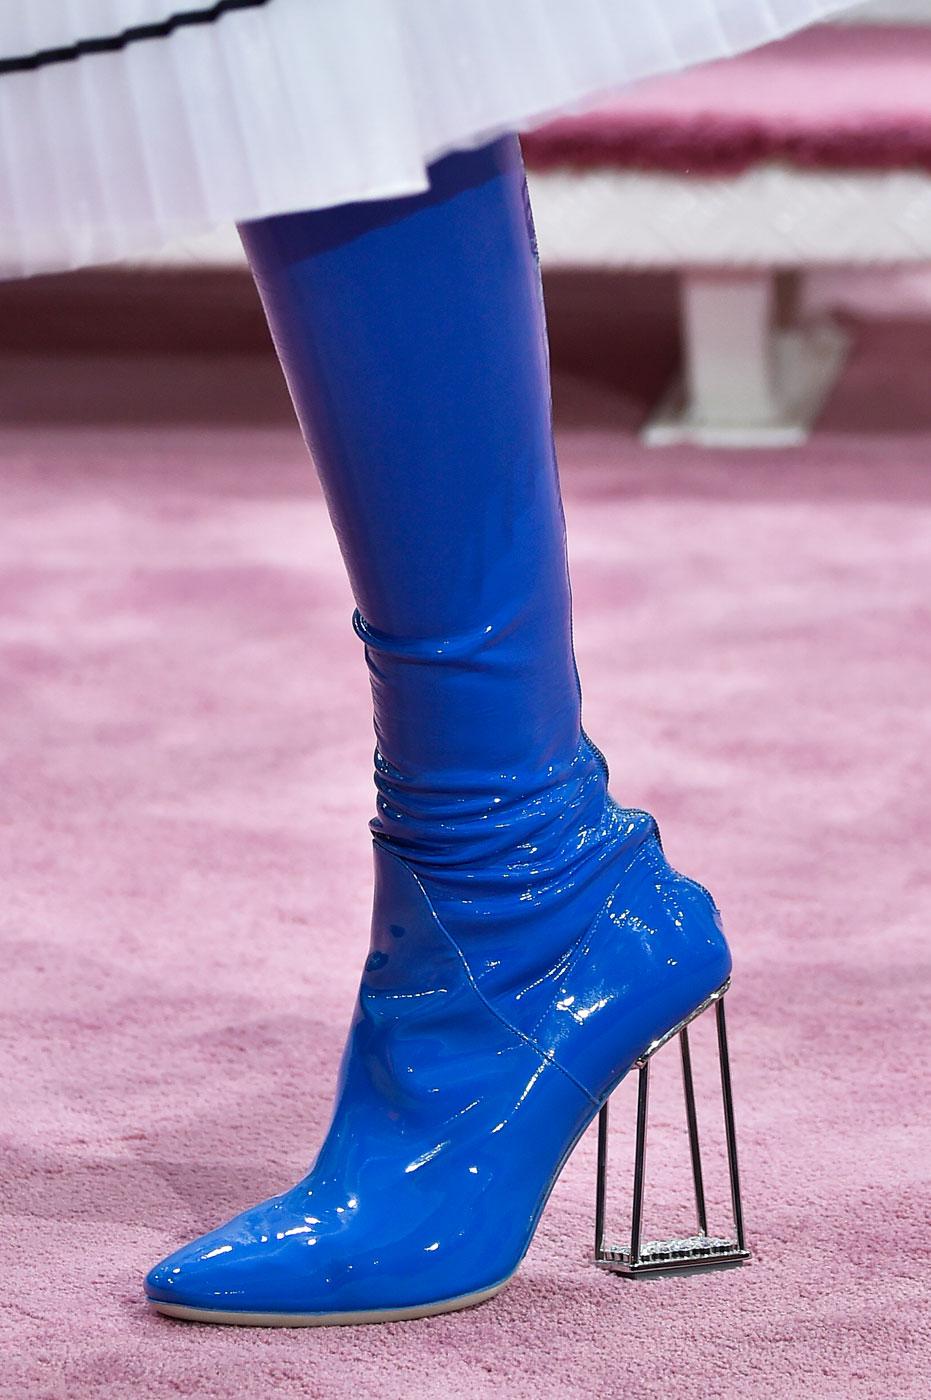 Christian-Dior-fashion-runway-show-close-ups-haute-couture-paris-spring-summer-2015-the-impression-179